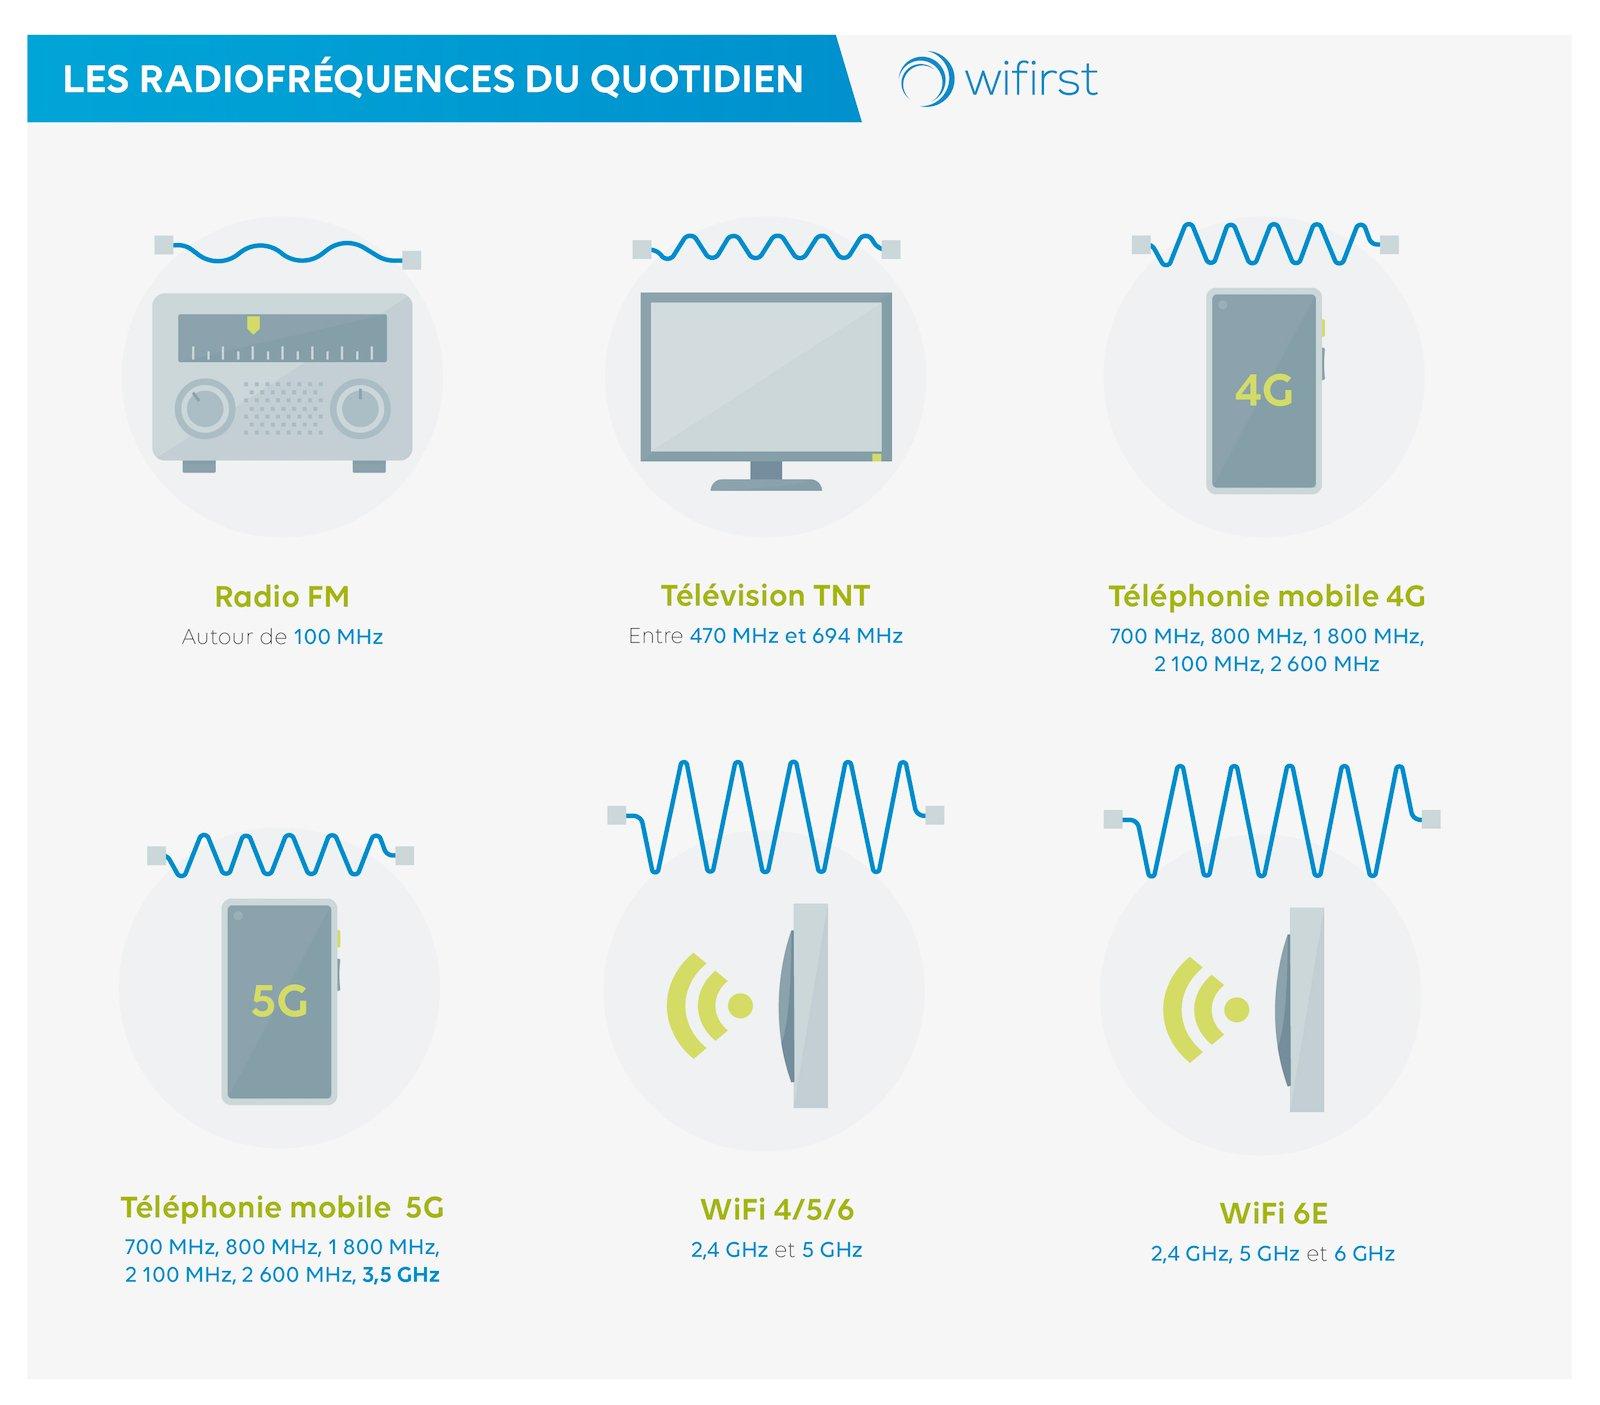 Wifi 6E - Radiofréquences du quotidien